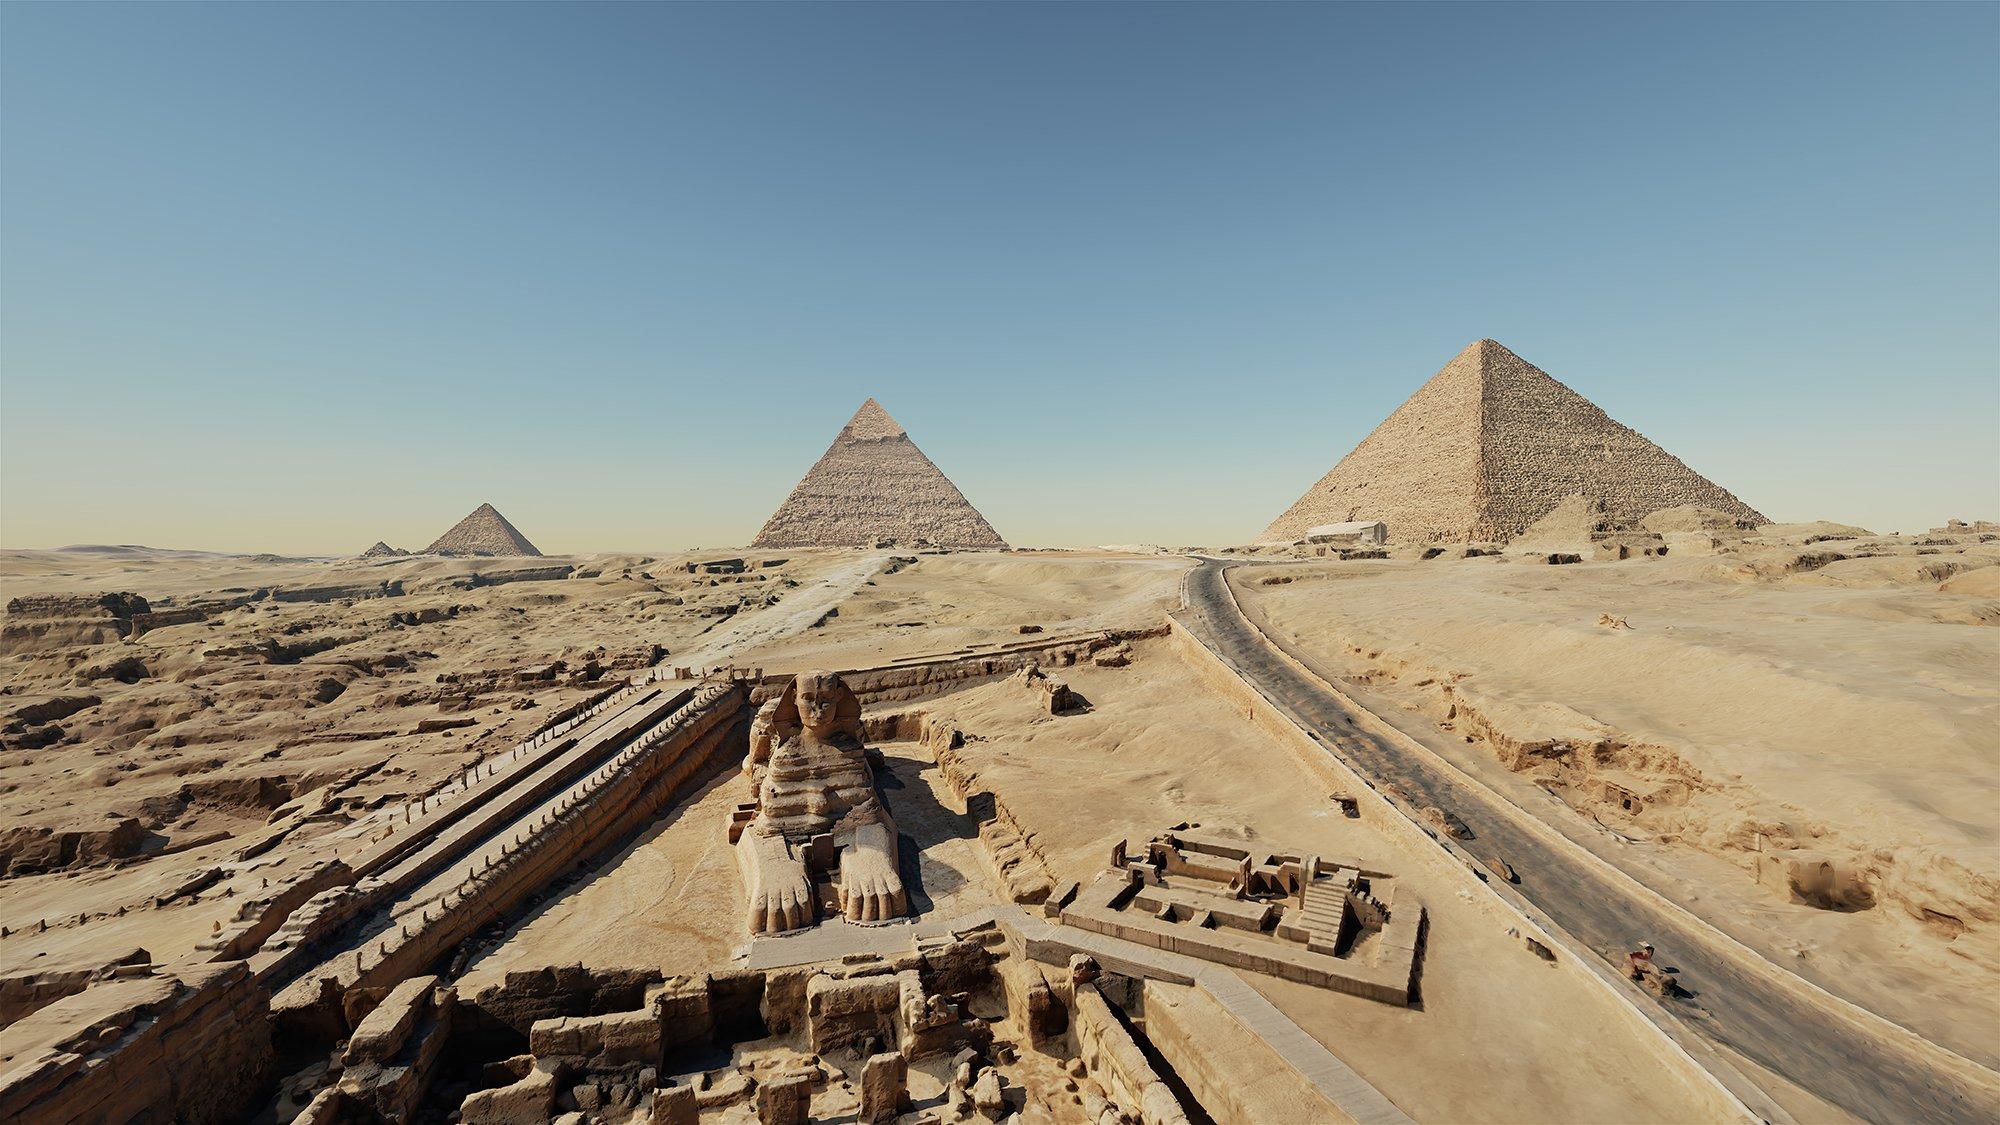 flyview_pyramides_00007_60c0e9cd8f910.jpg